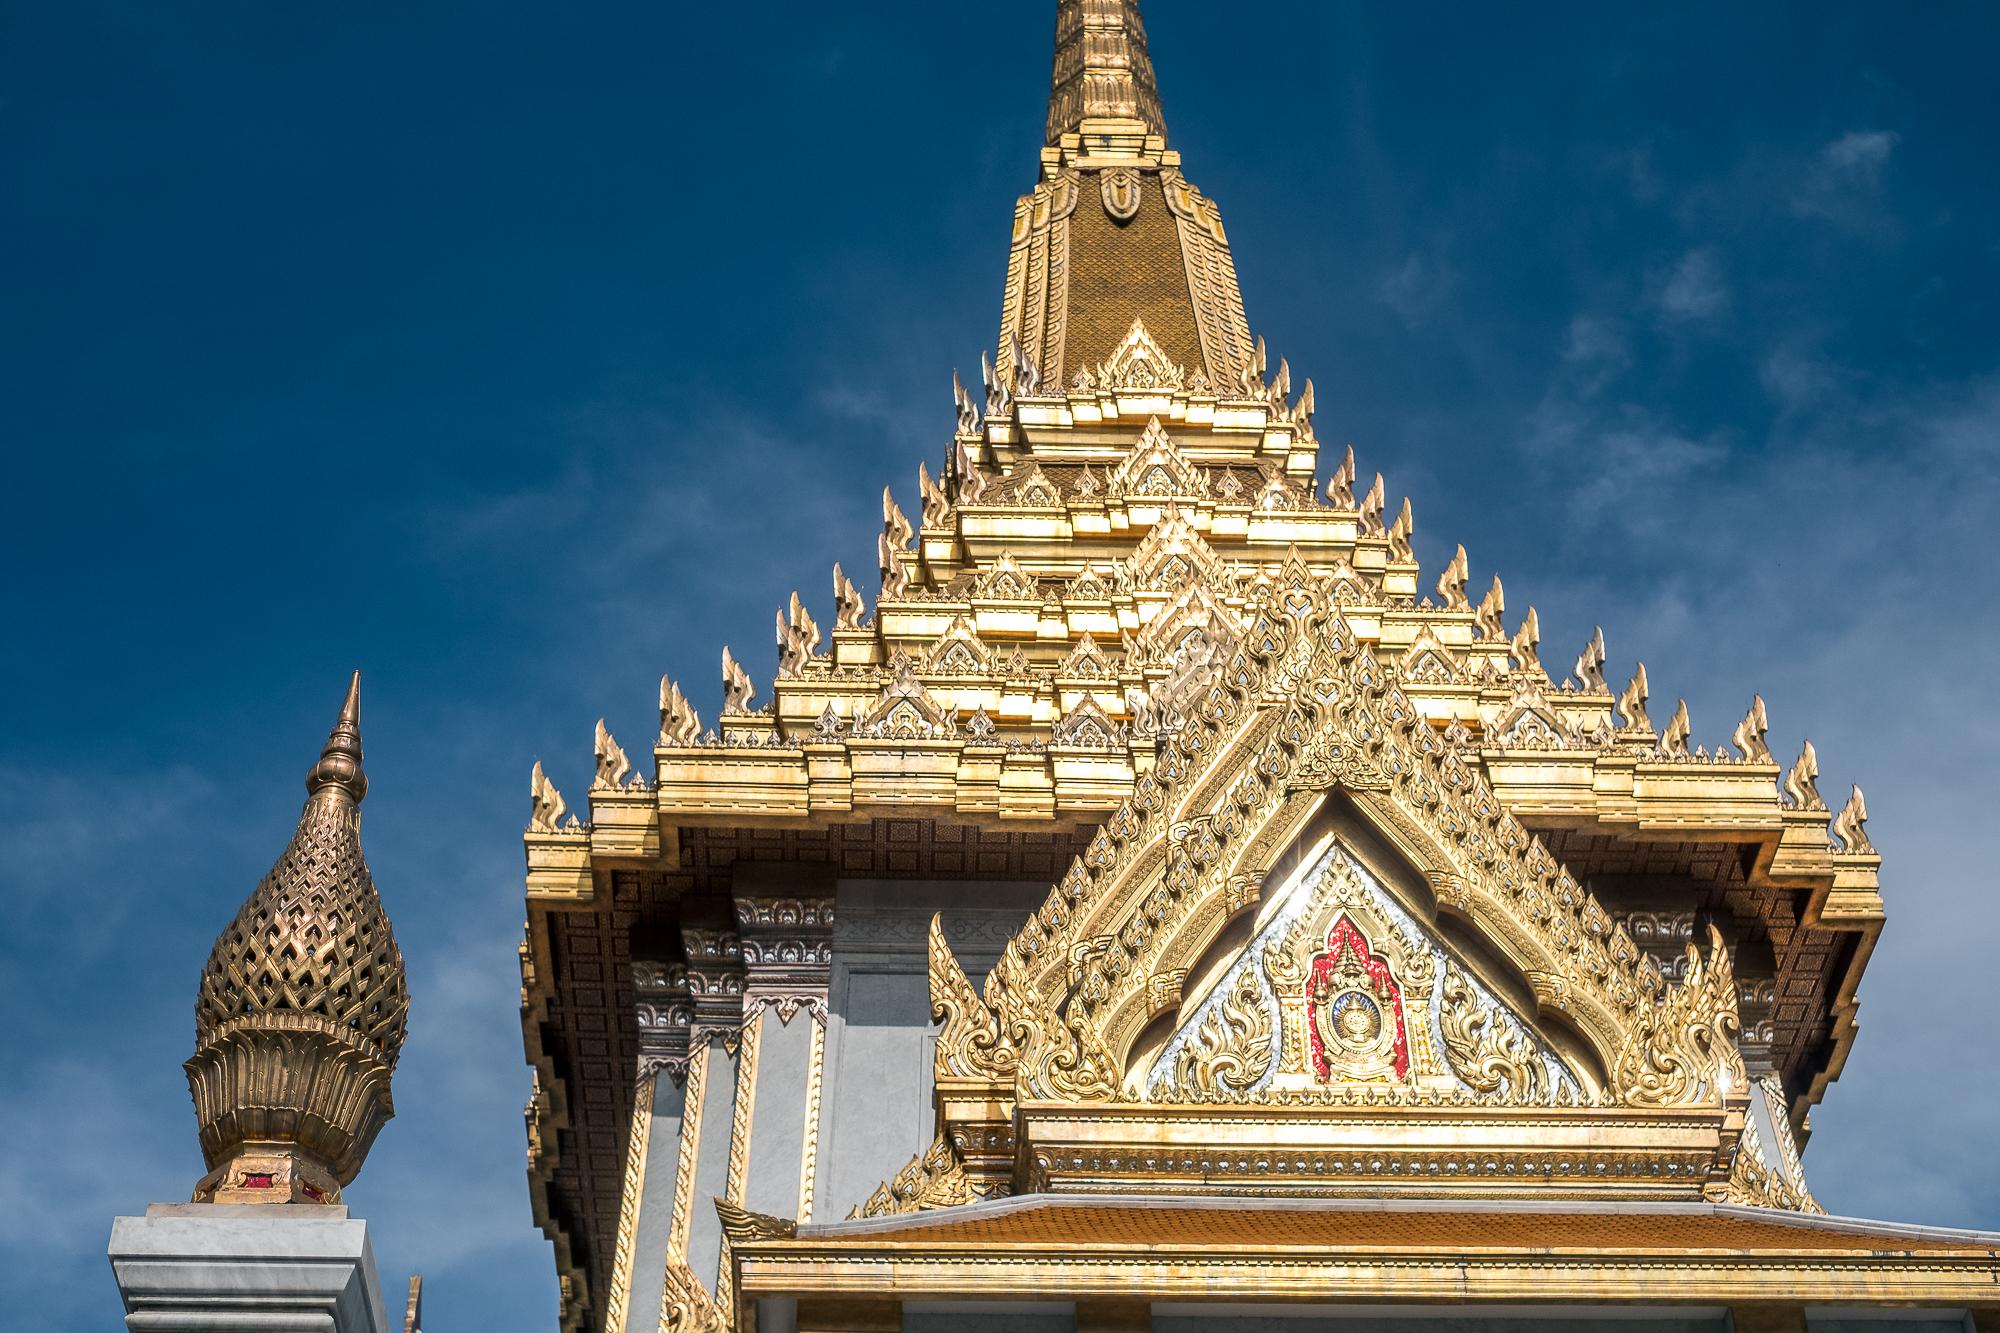 THAILAND_Honeymoon_TheOutsiderBlog_DSCF0088.JPG